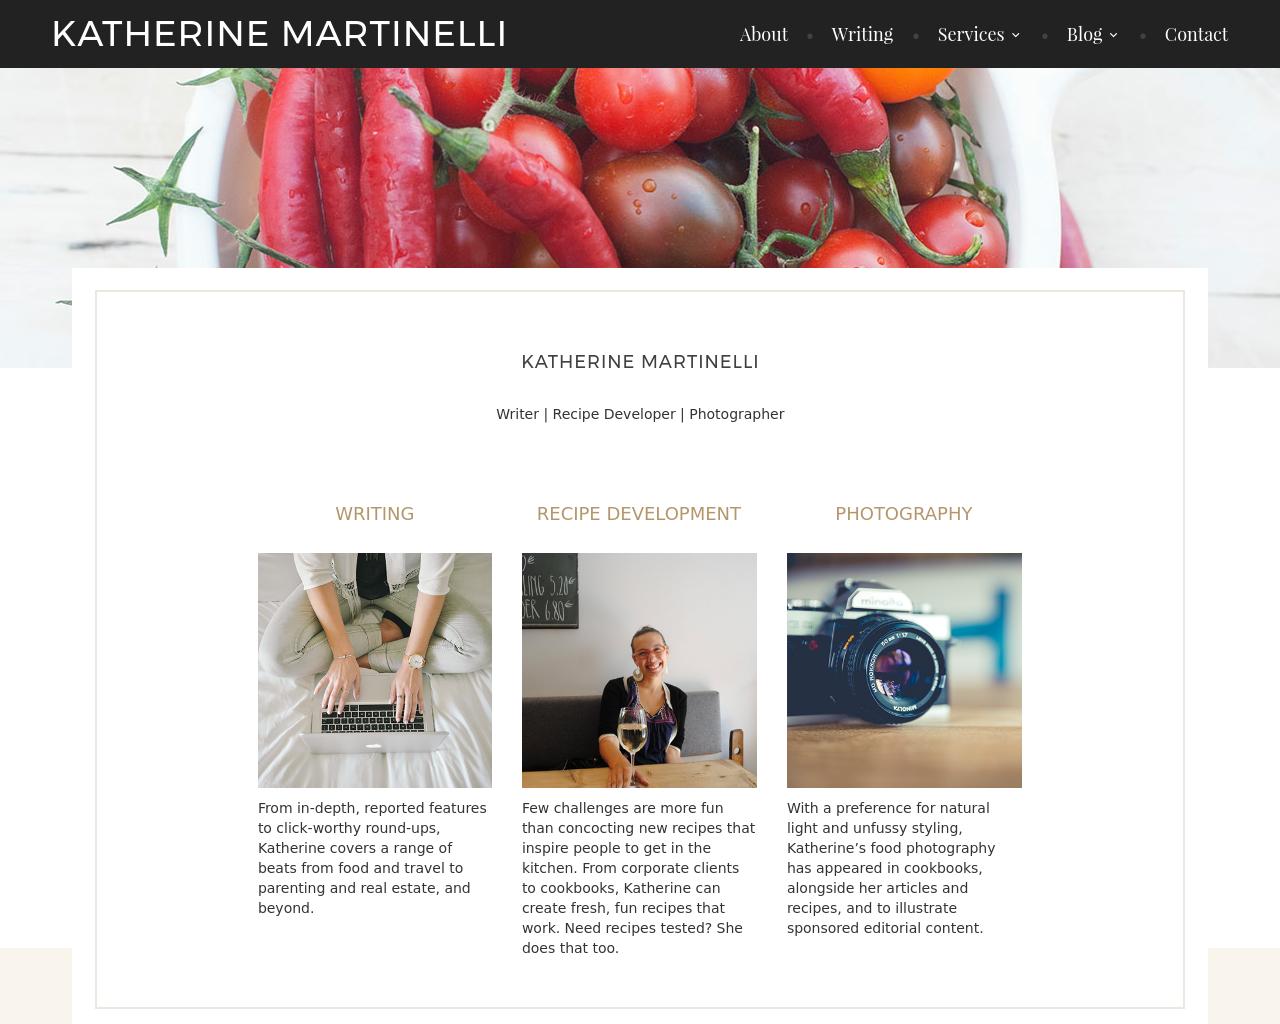 Katherine-Martinelli-Advertising-Reviews-Pricing